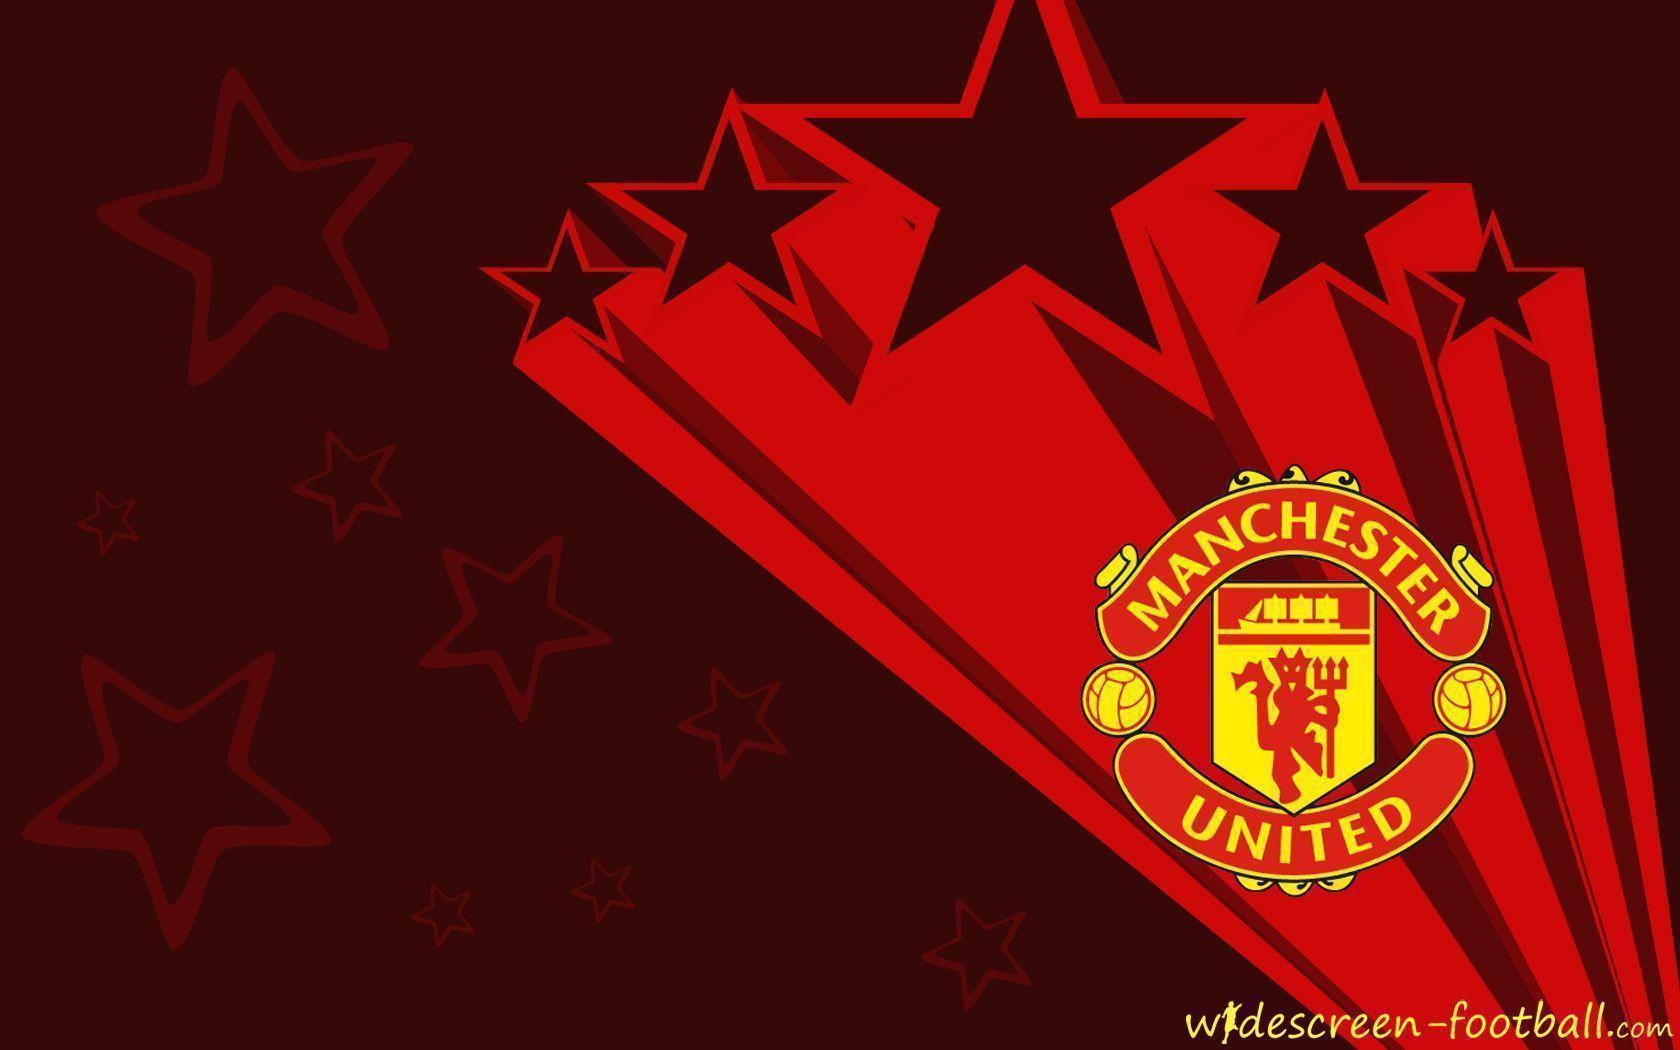 Manchester United Wallpaper Smartphone | Manuwallhd.com